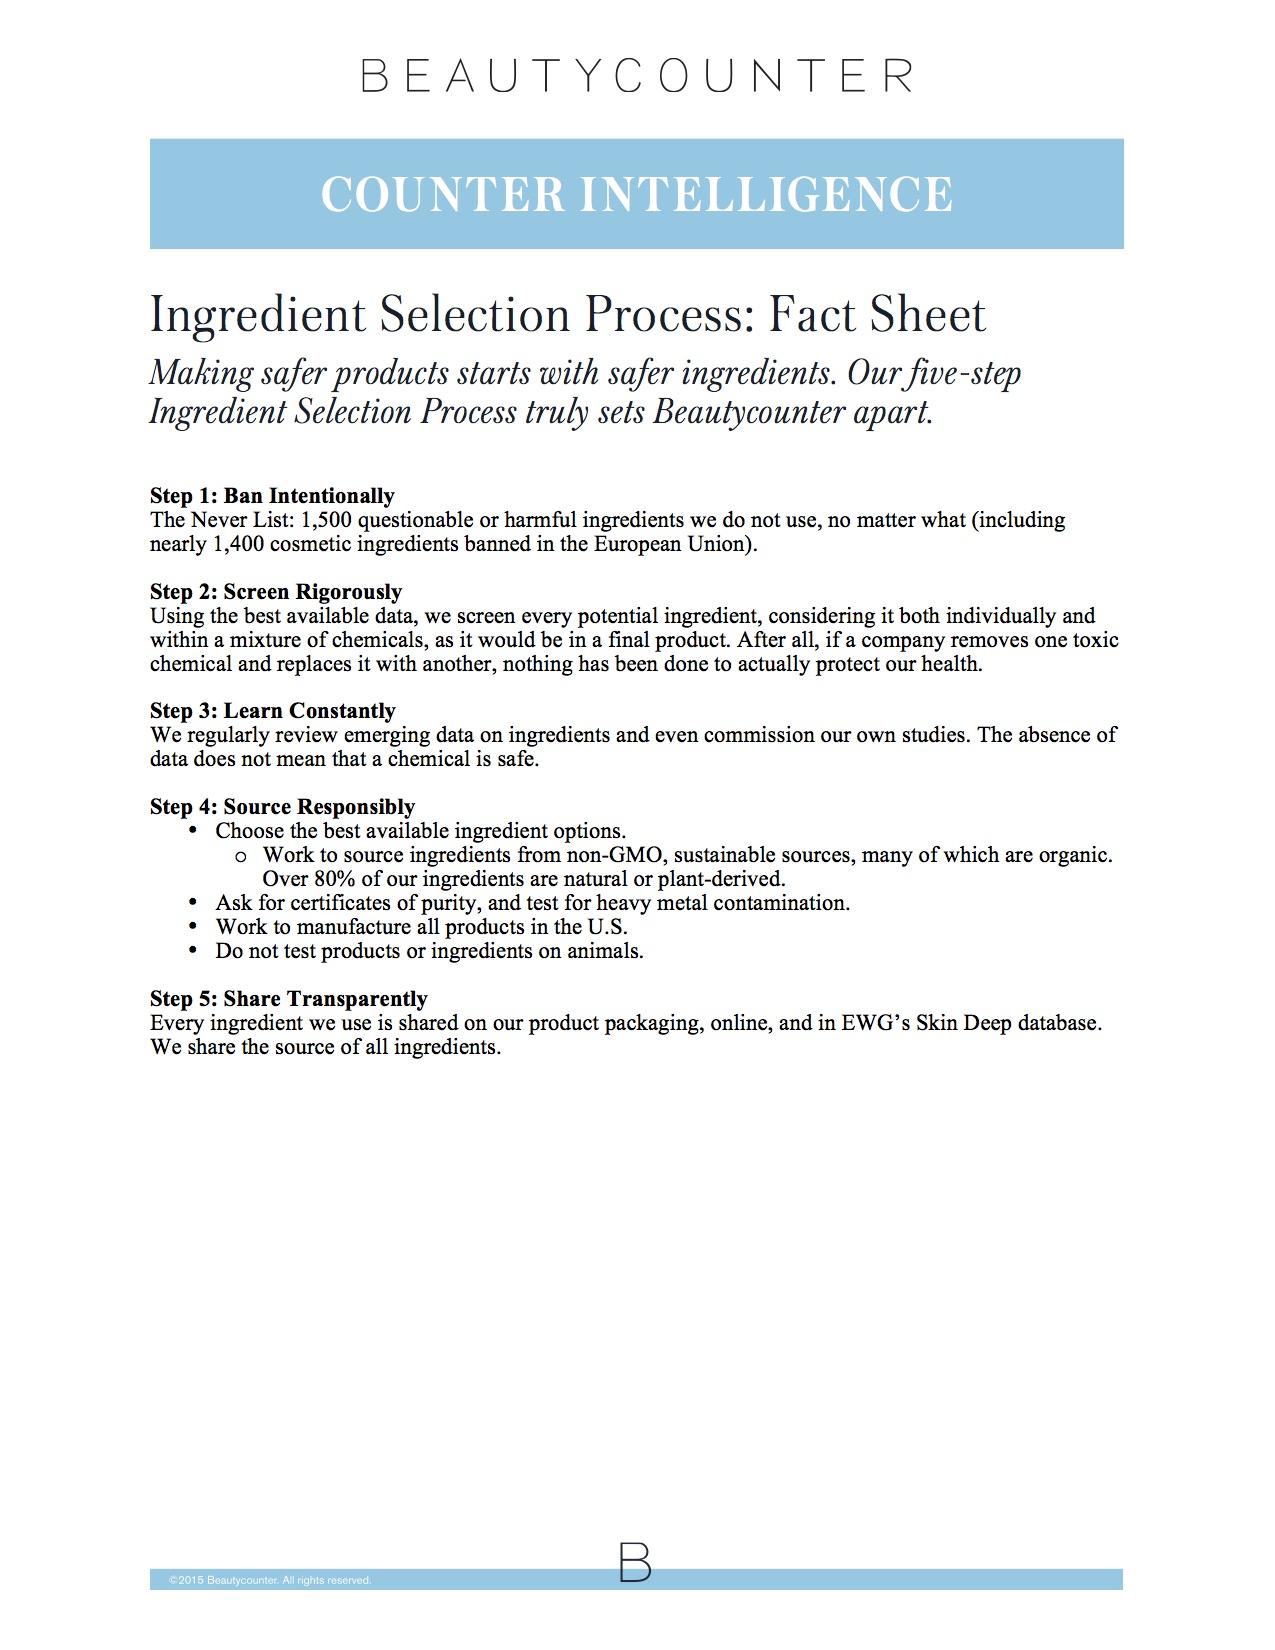 Ingredient_Selection_process.jpg